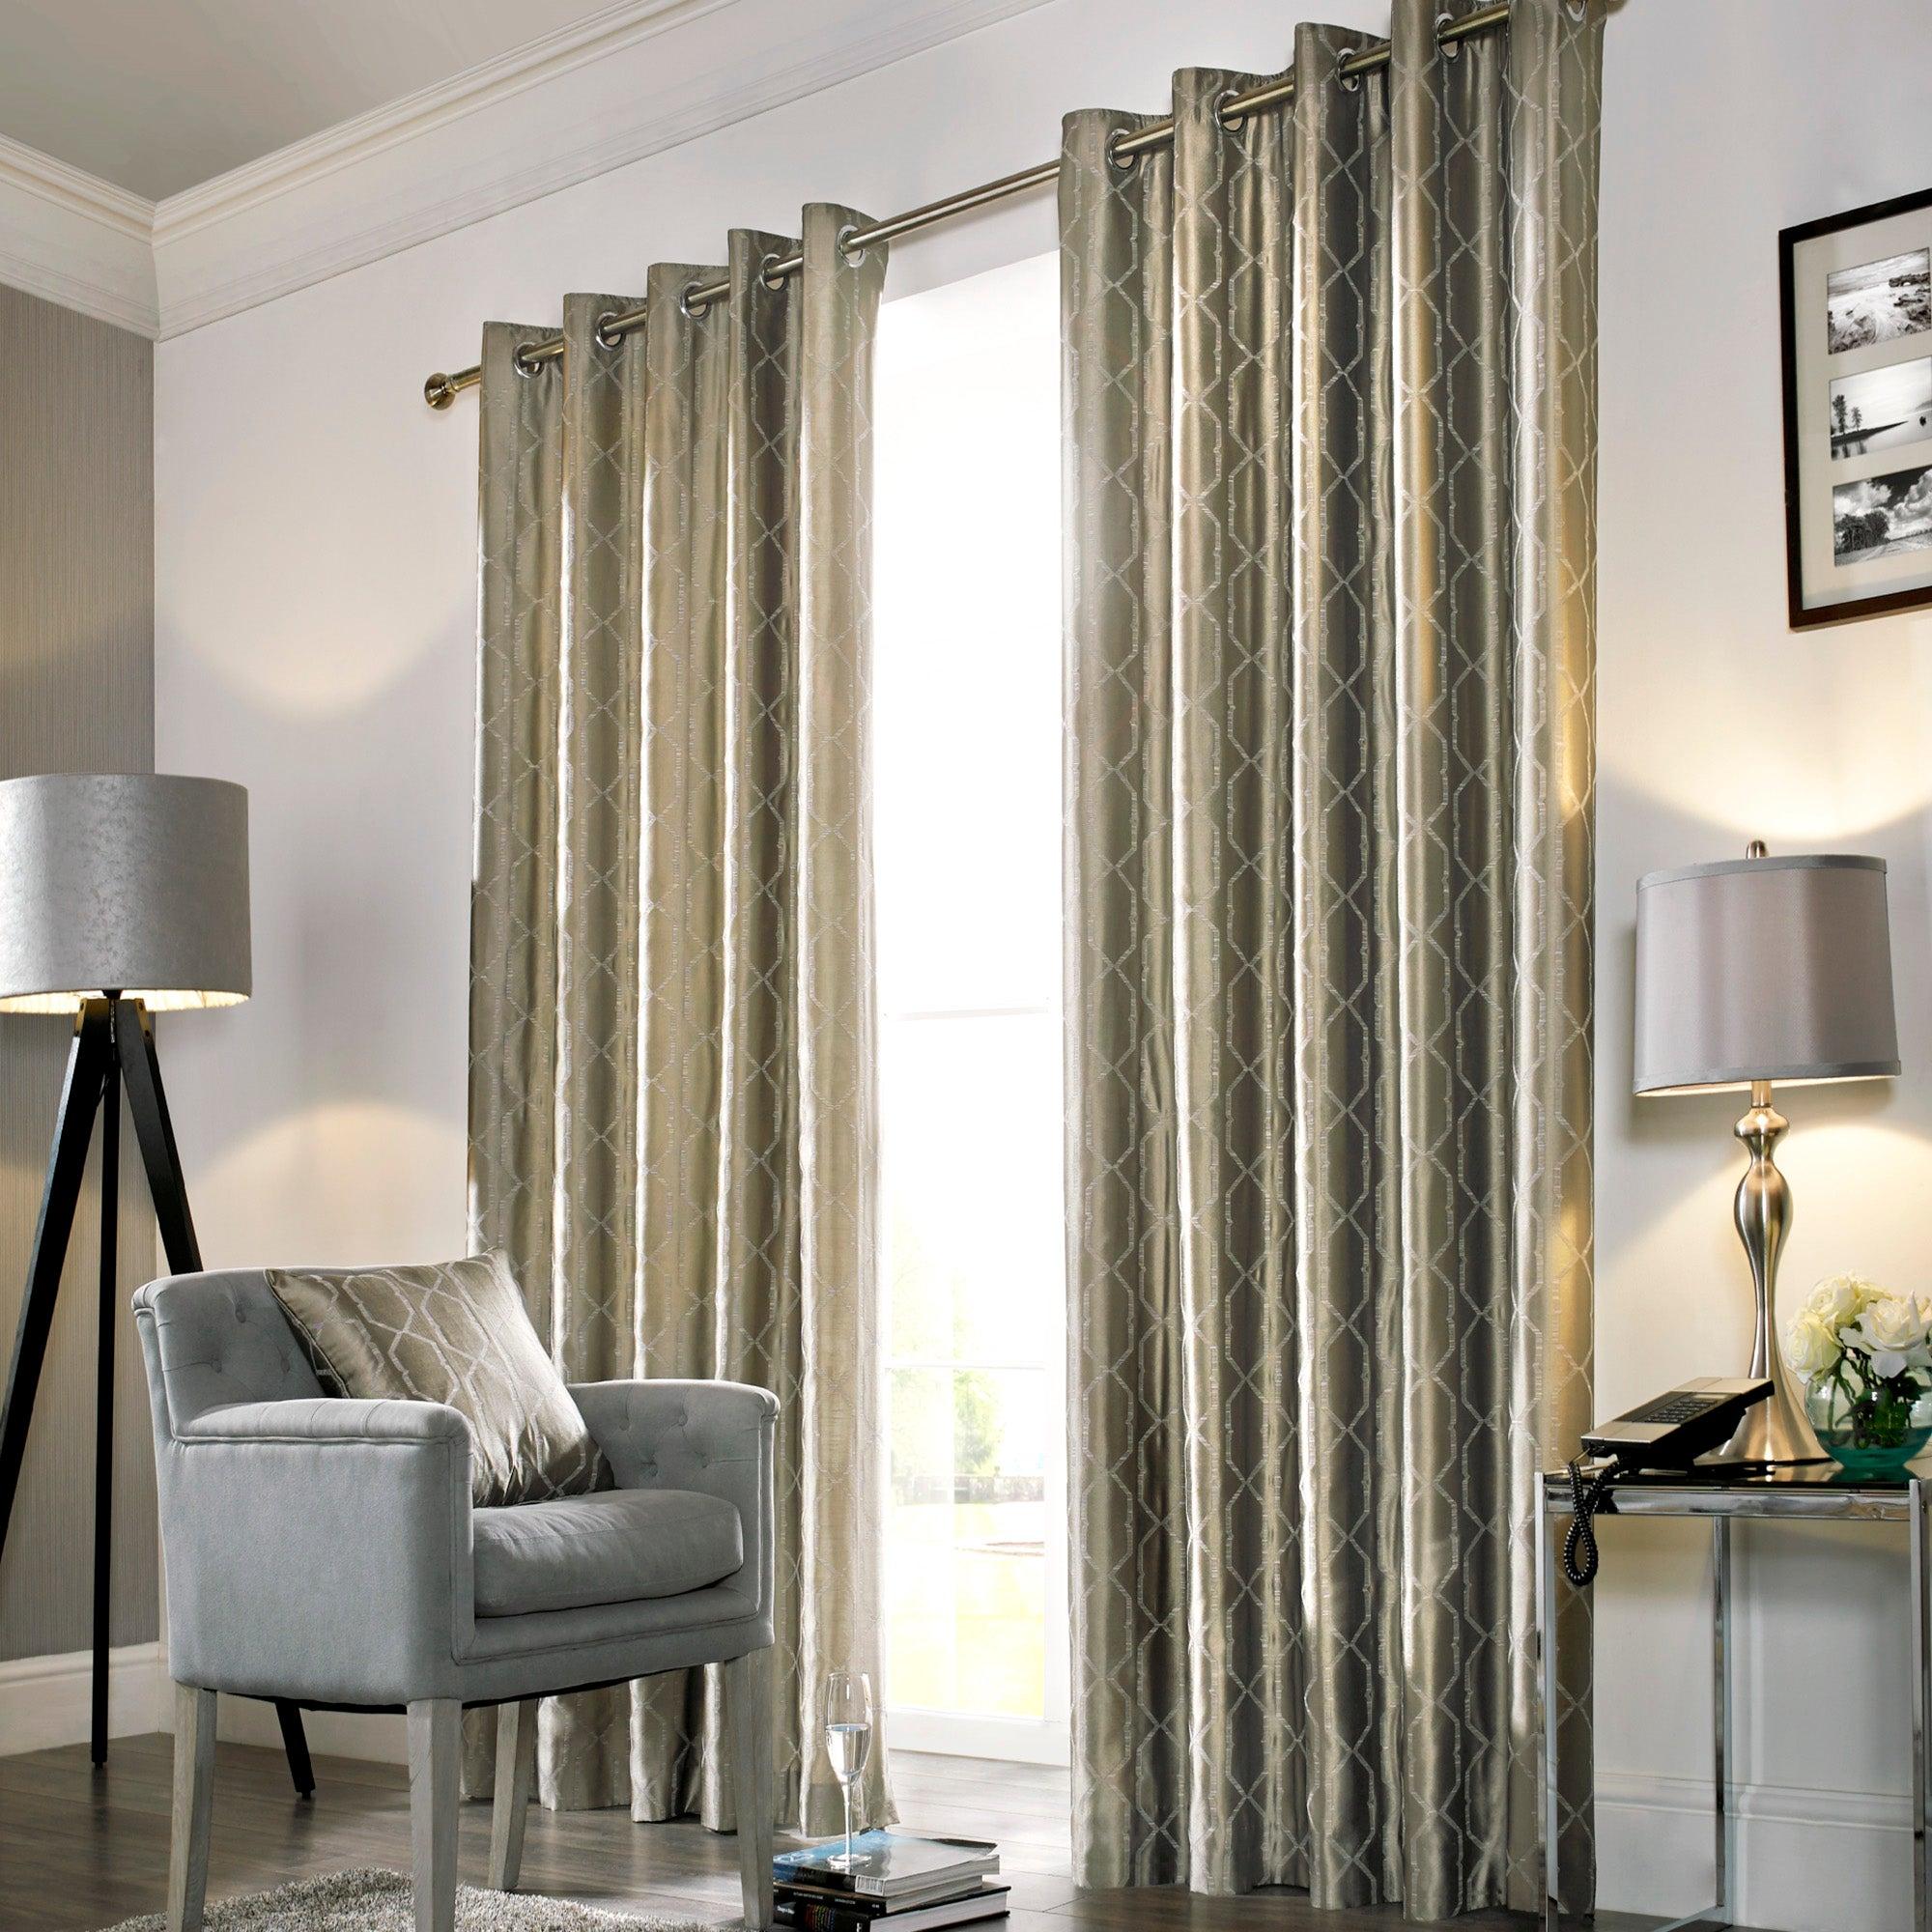 Hotel Mink Lexington Lined Eyelet Curtains